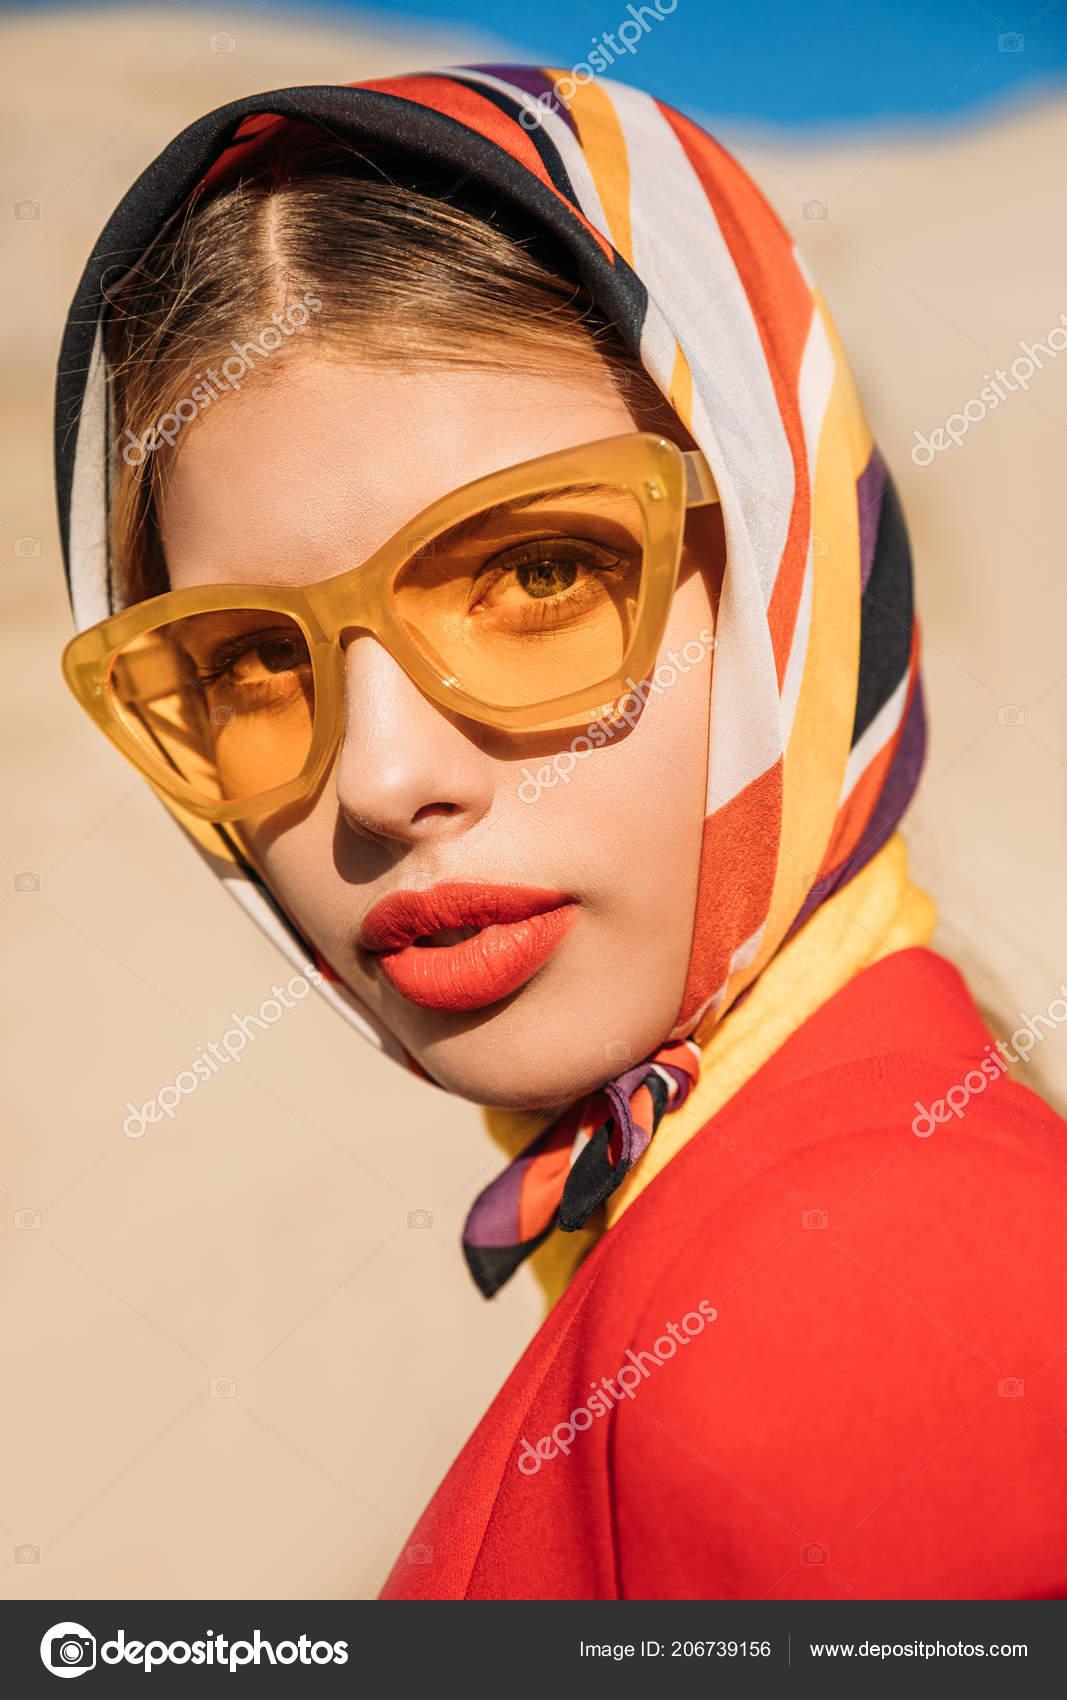 4170eb1a48 Κομψή ελκυστική κοπέλα ποζάρει στα κίτρινα γυαλιά ηλίου και μεταξωτό  μαντήλι– εικόνα αρχείου